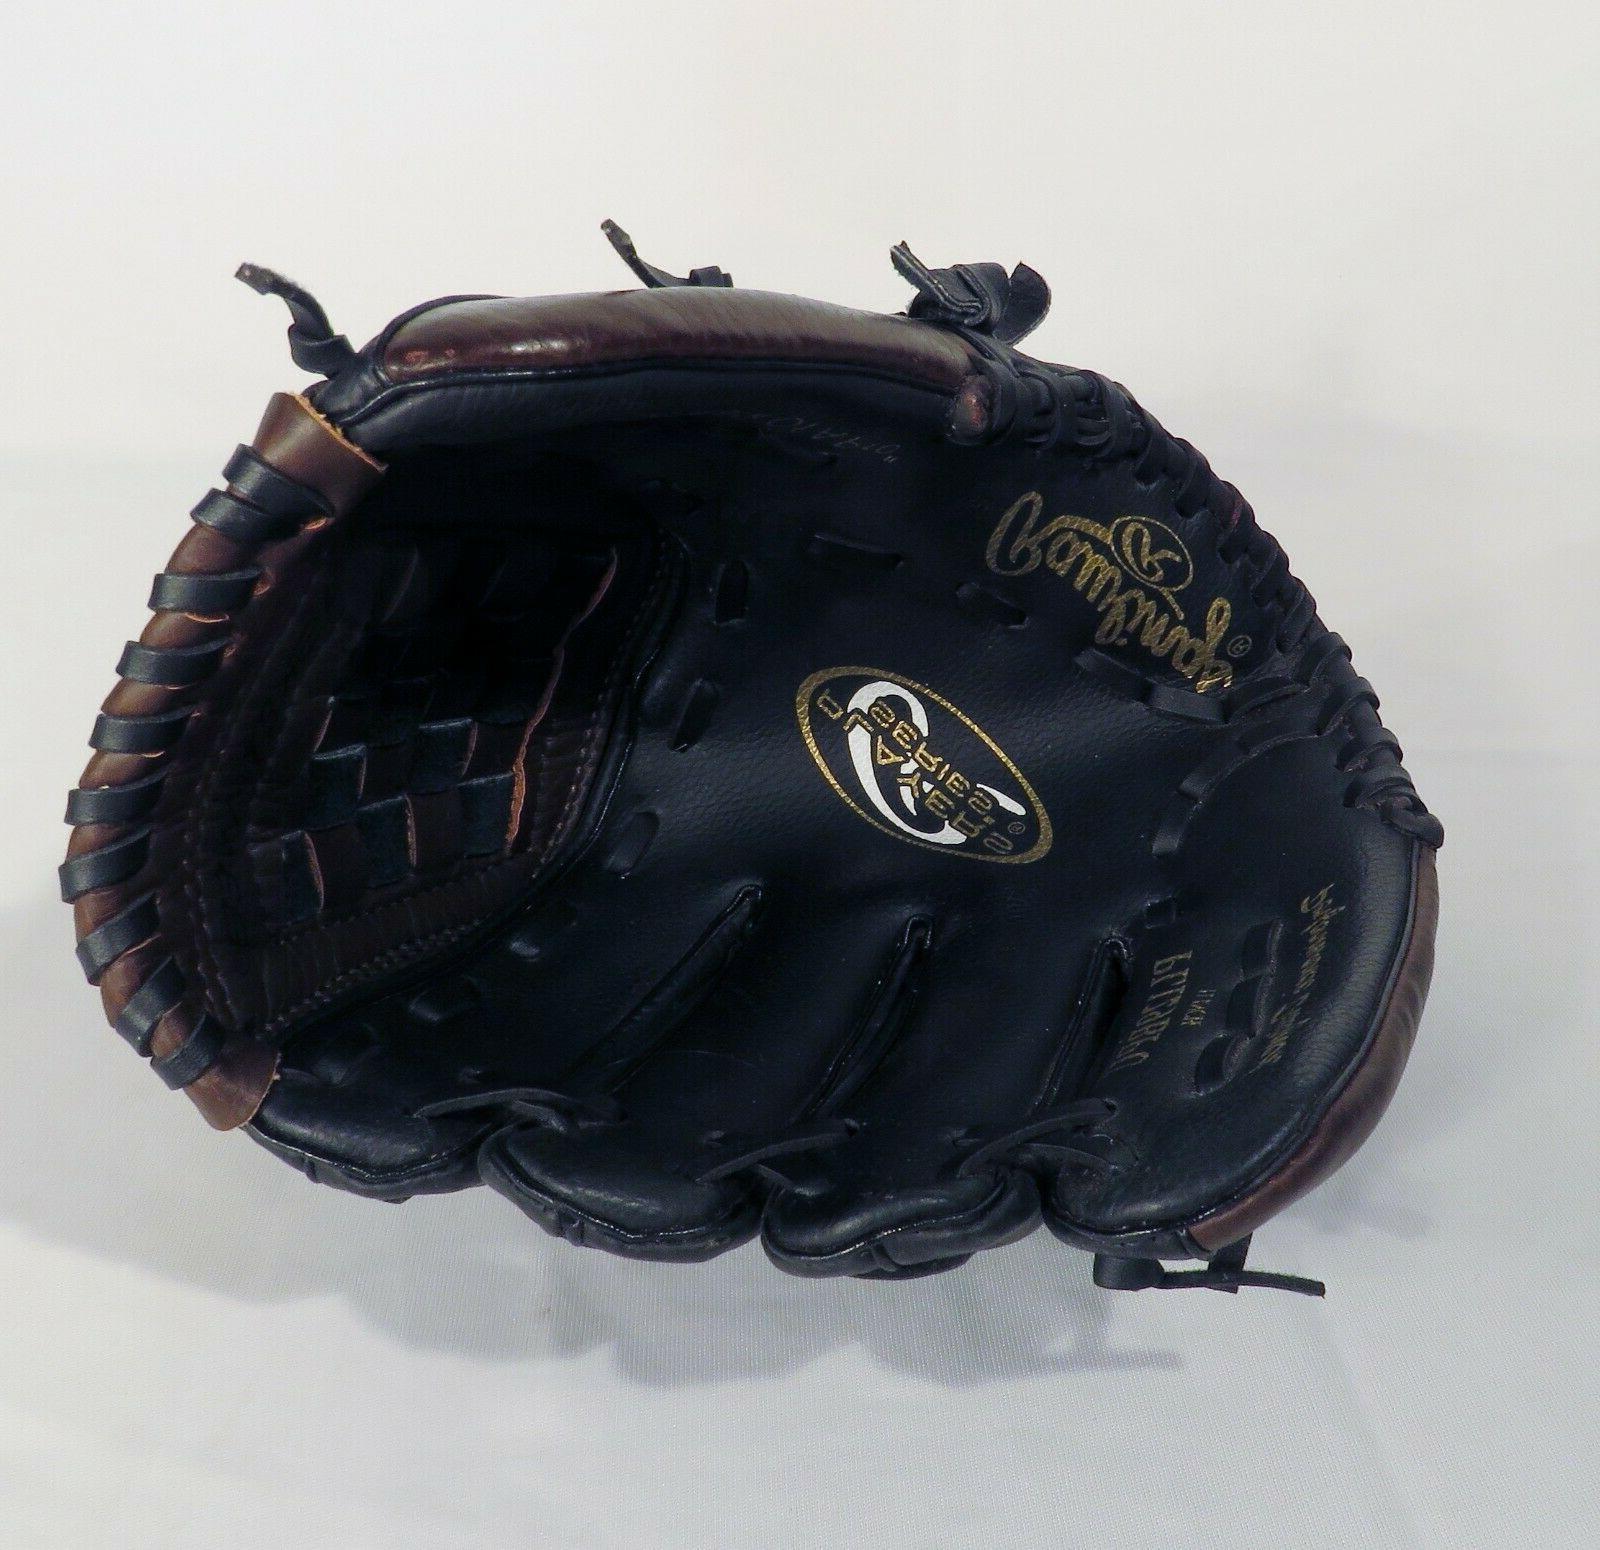 "RAWLINGS Players 11"" Baseball Glove Mitt Right Hand Throw ERBB5"